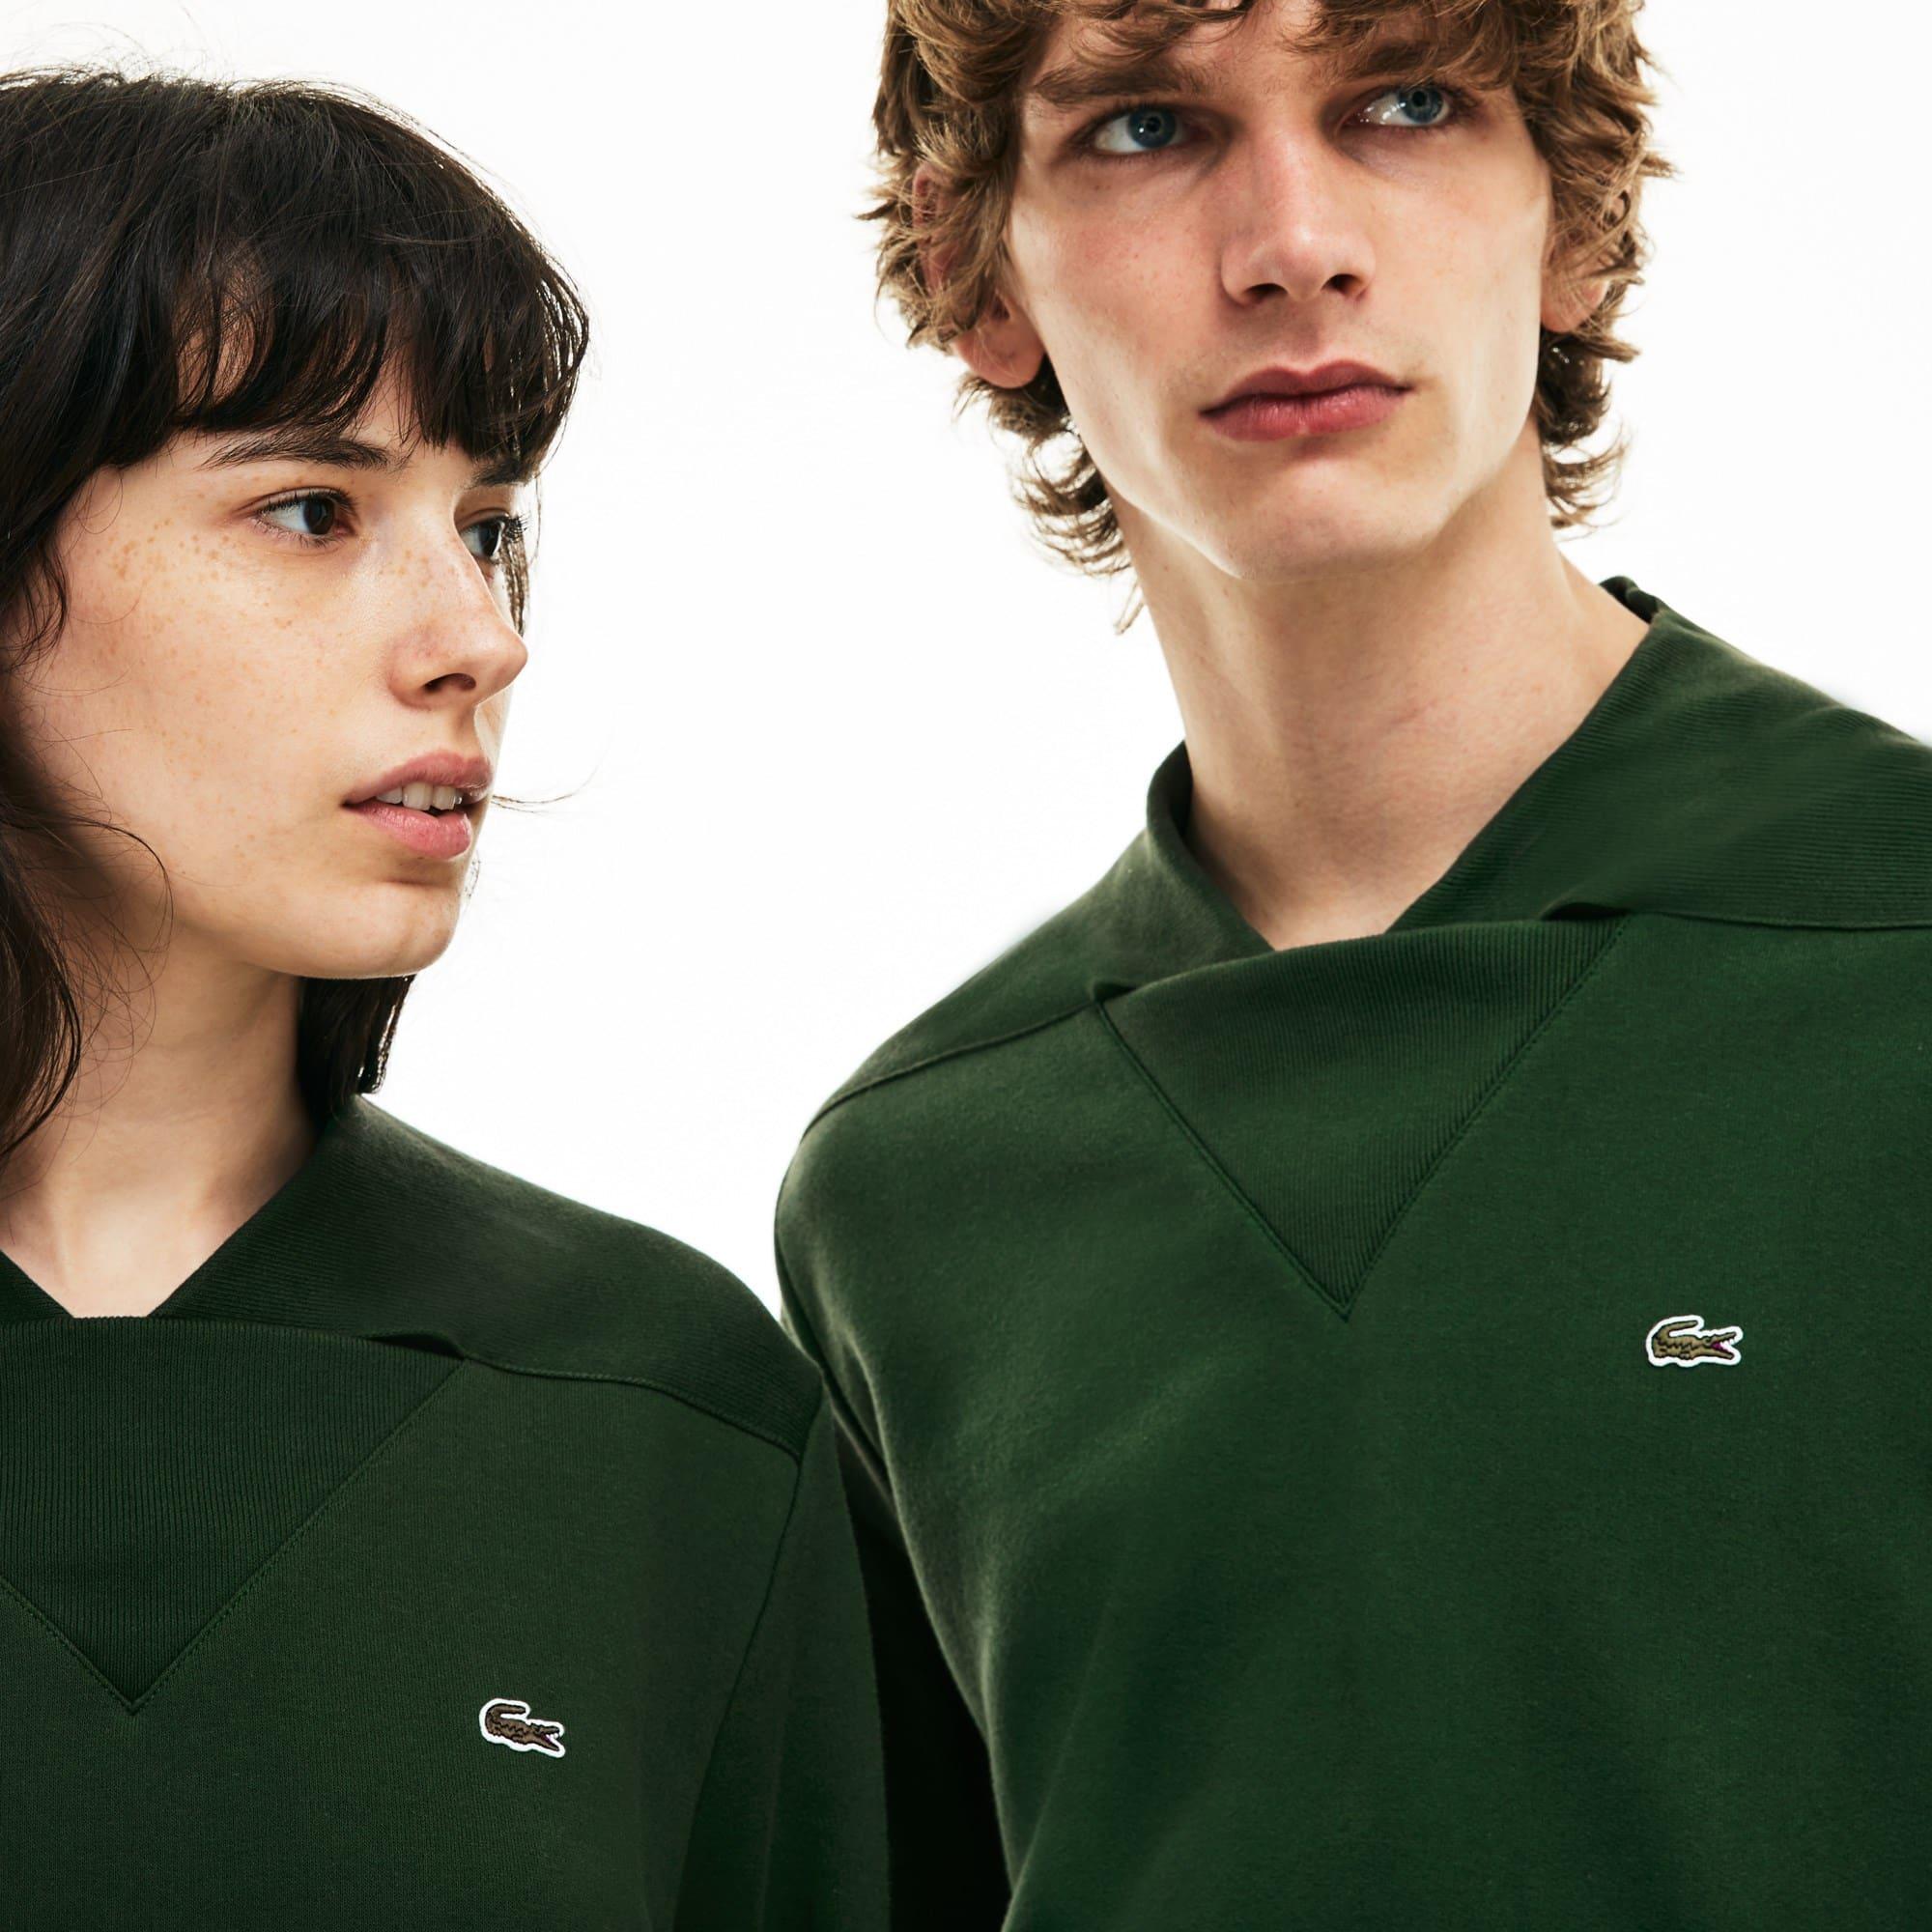 Unisex 85th Anniversary Limited Edition V-neck Fleece Sweatshirt